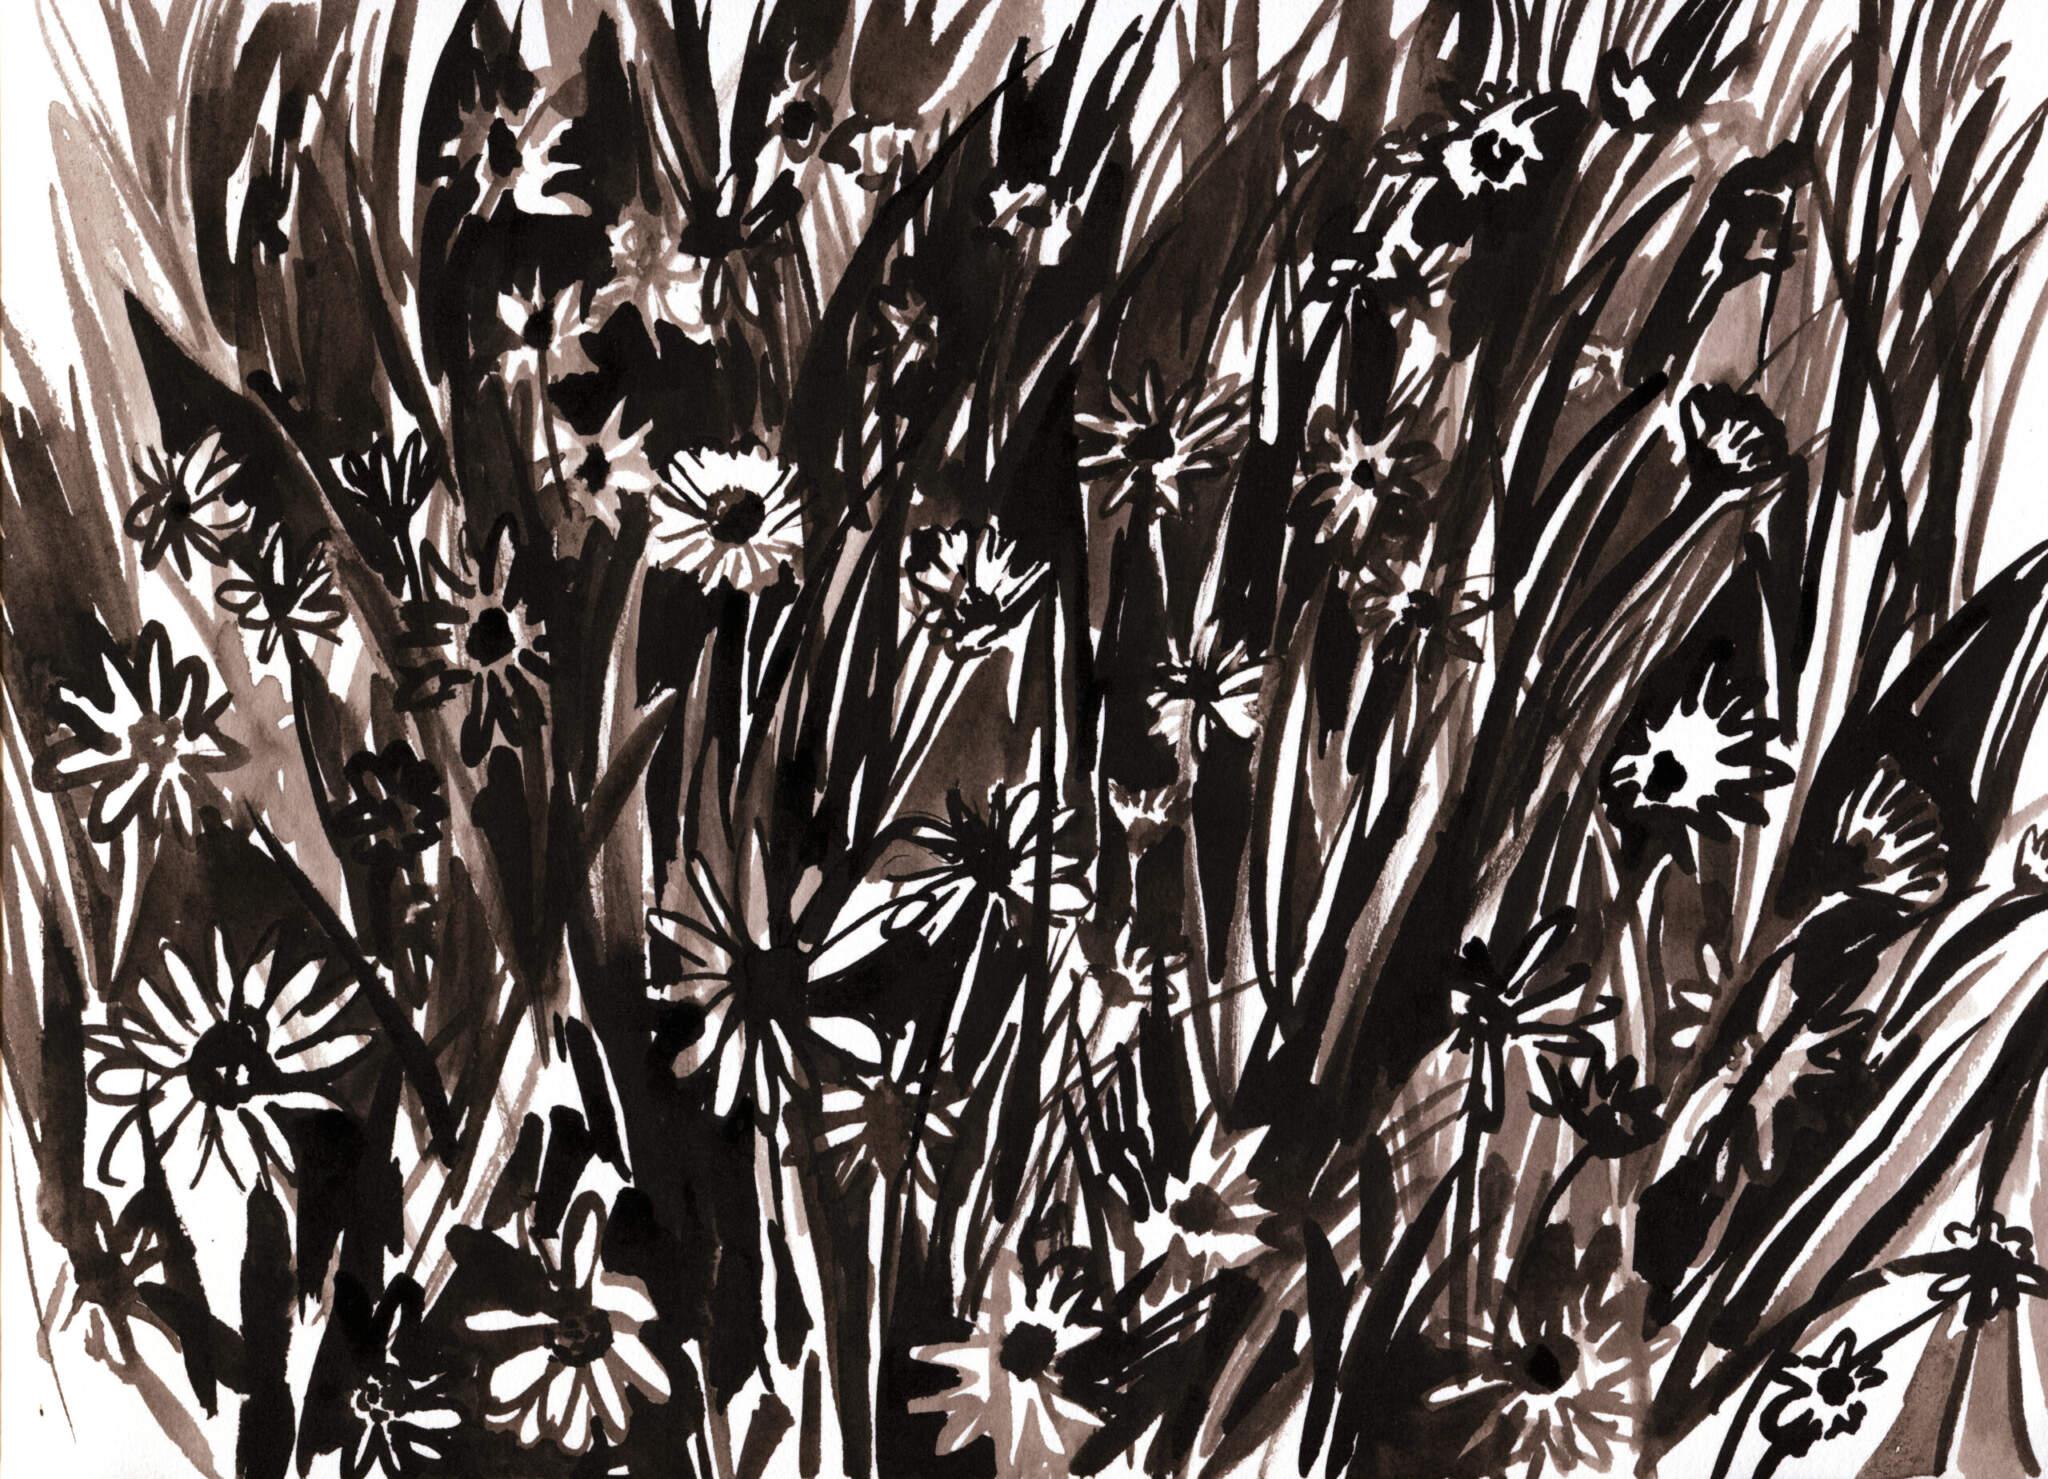 KJP DAISYS 6500 scaled - Daisies by Kirsty Jones